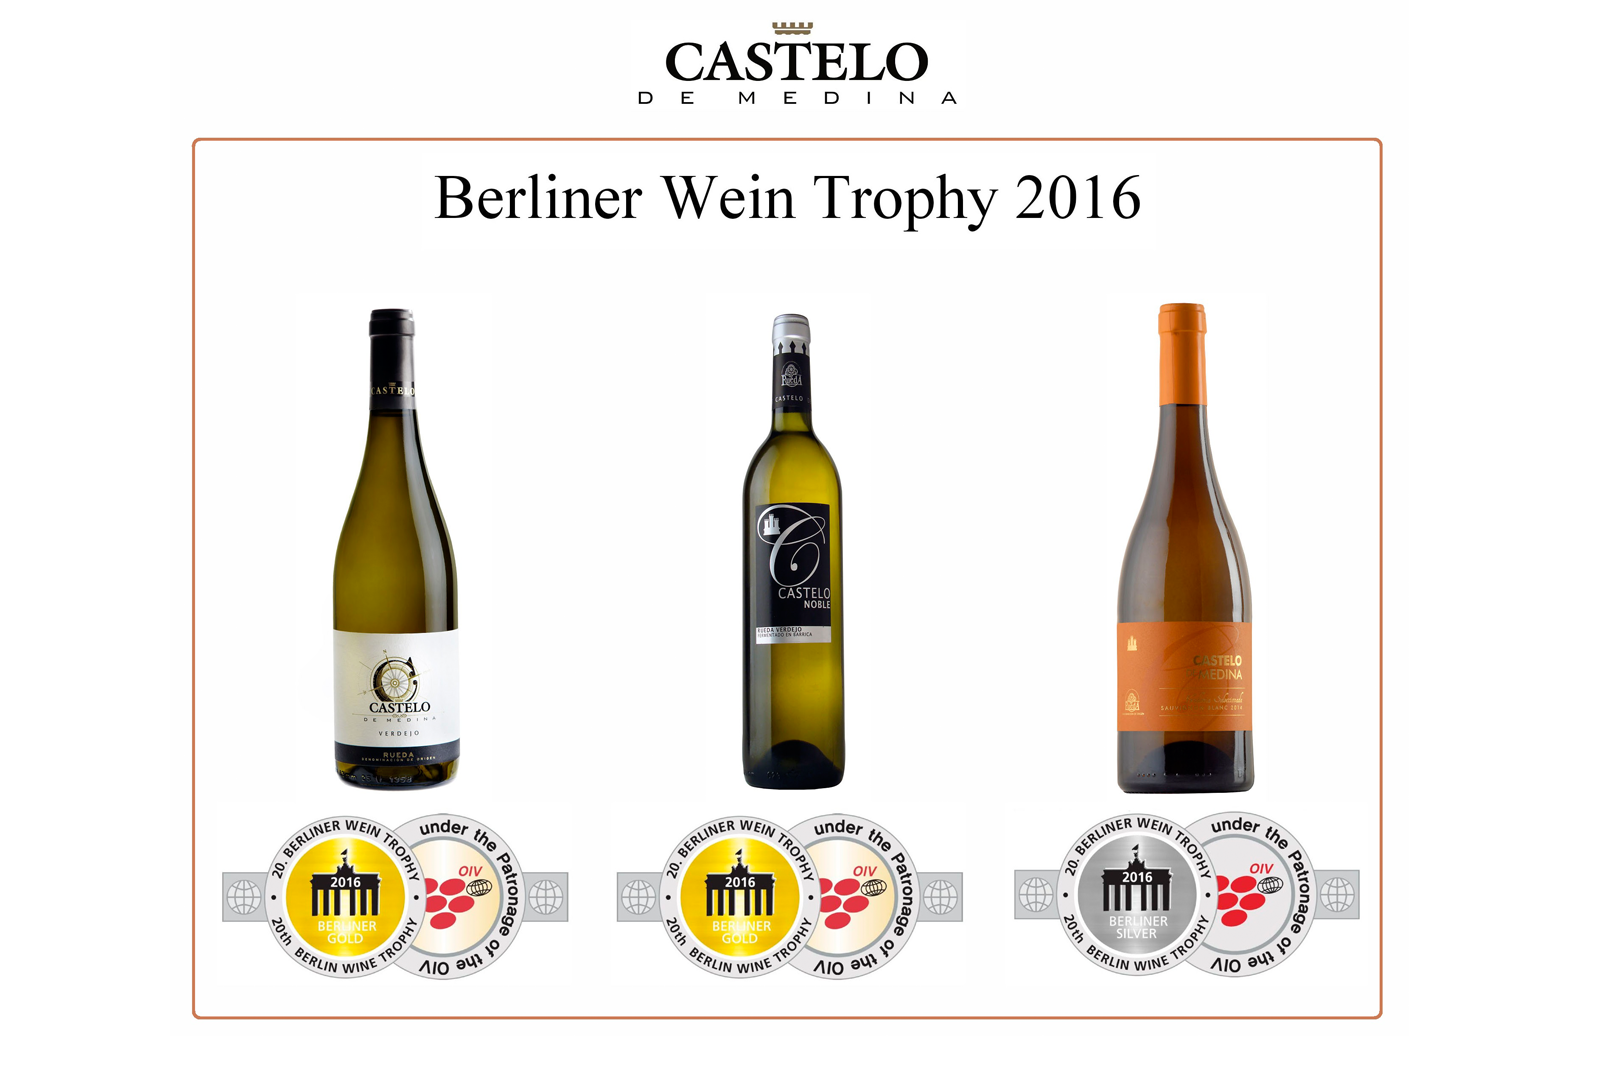 Bodegas Castelo de Medina en el Berliner Wein Trophy 2016.